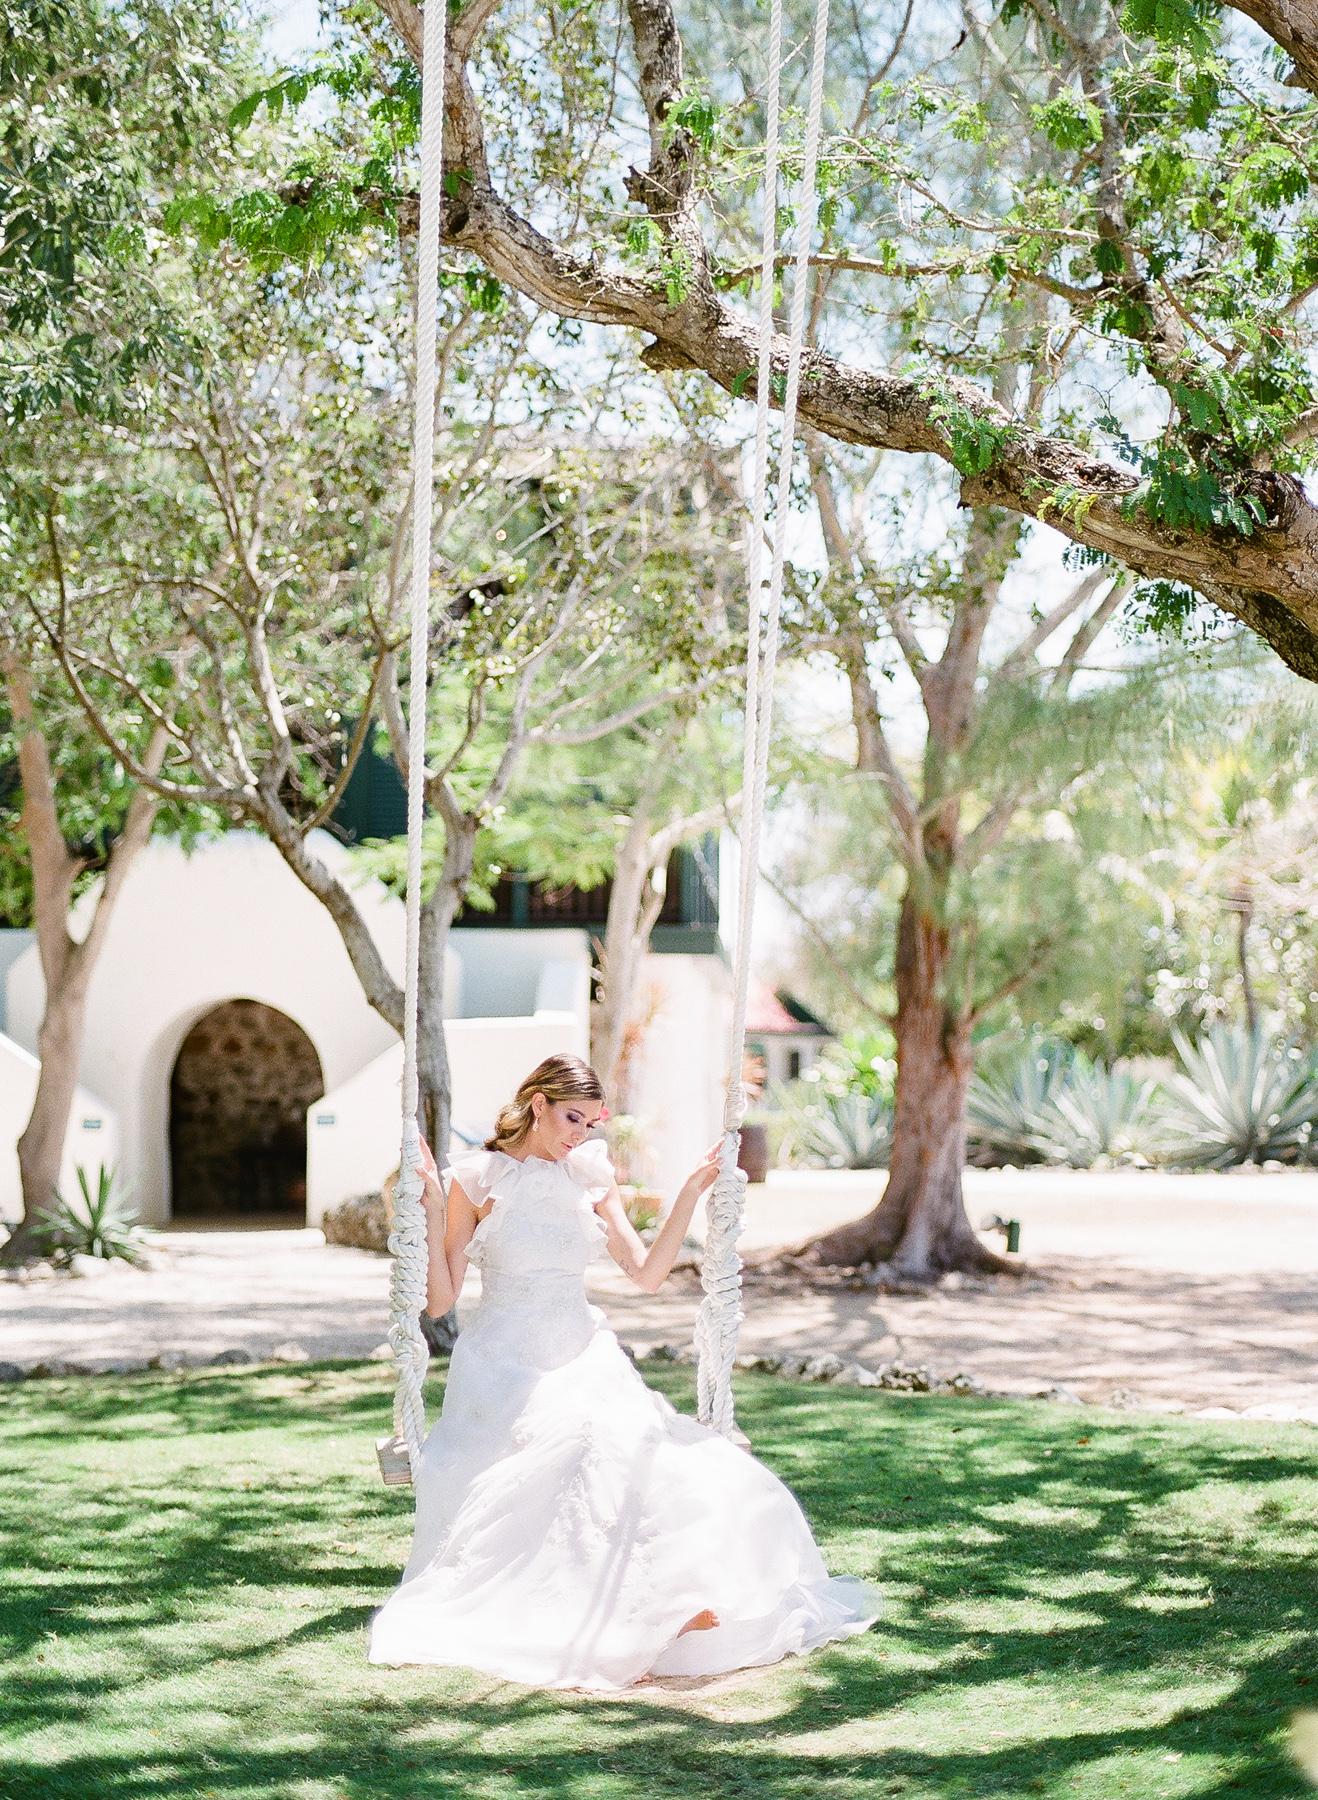 Grand-Cayman-Wedding-014.jpg